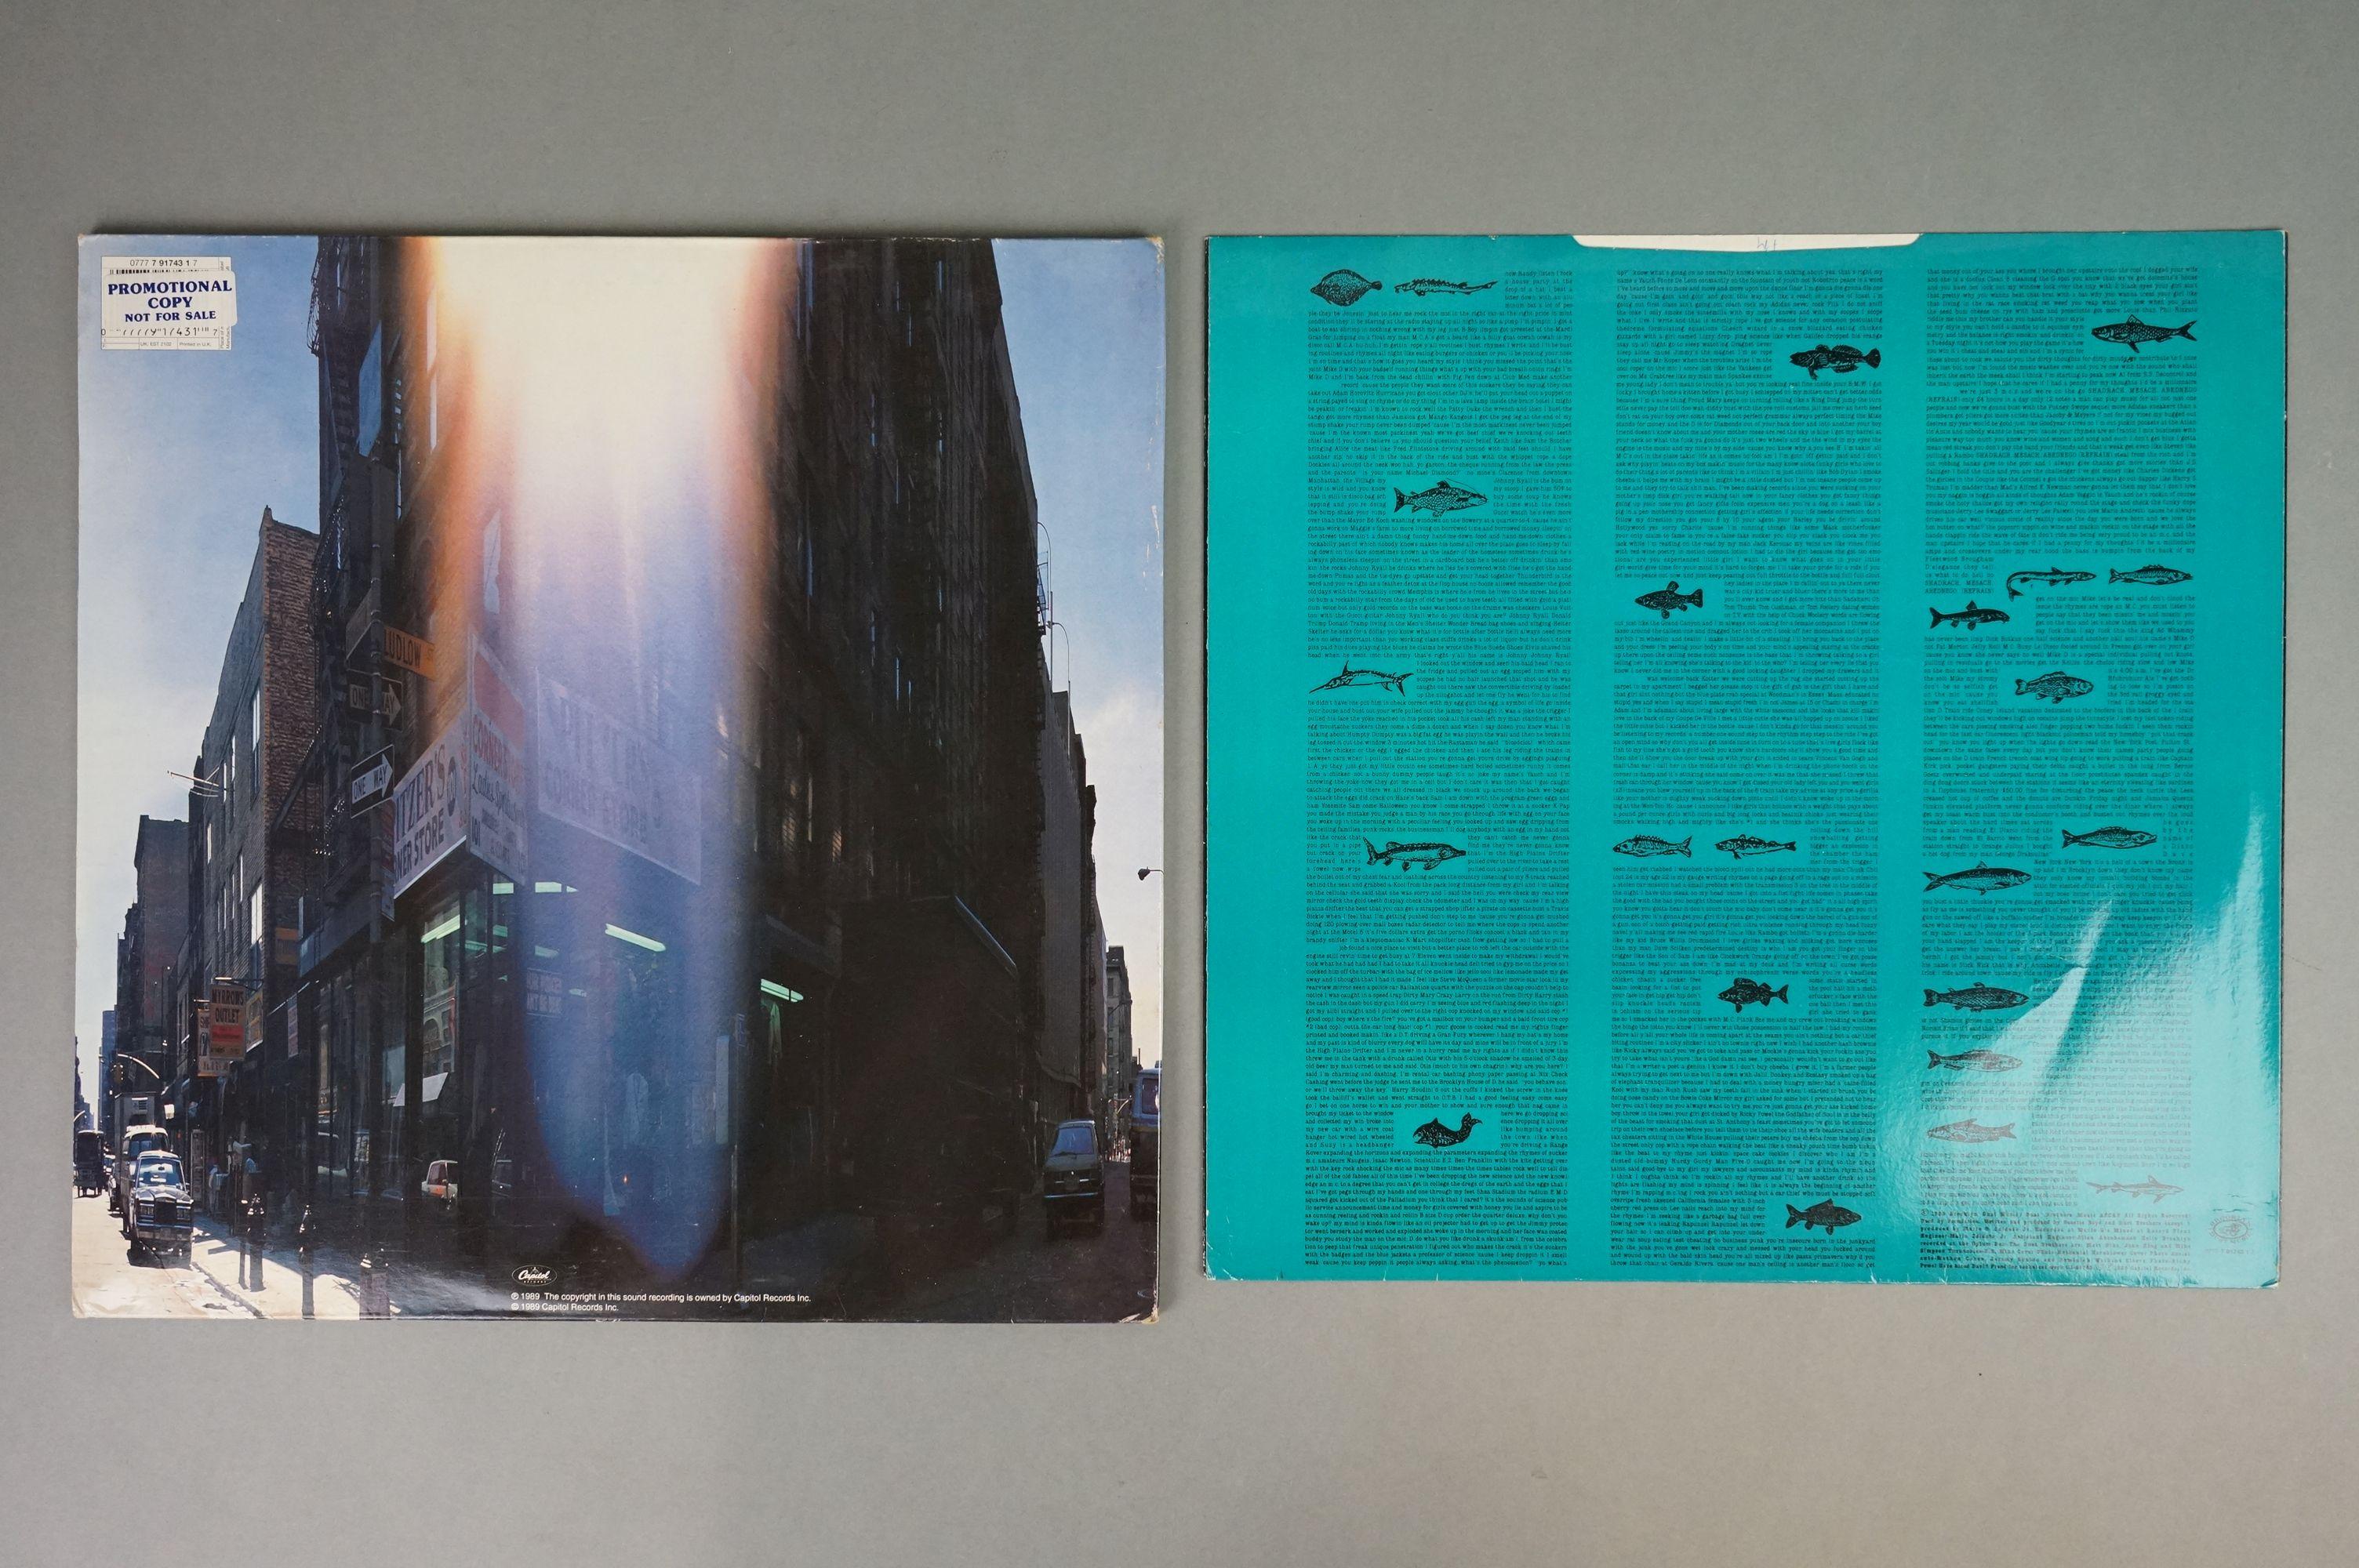 Vinyl - Beastie Boys Paul's Boutique LP on Capitol UK 077779174317 UKEST2102 with 'promotional - Image 3 of 6